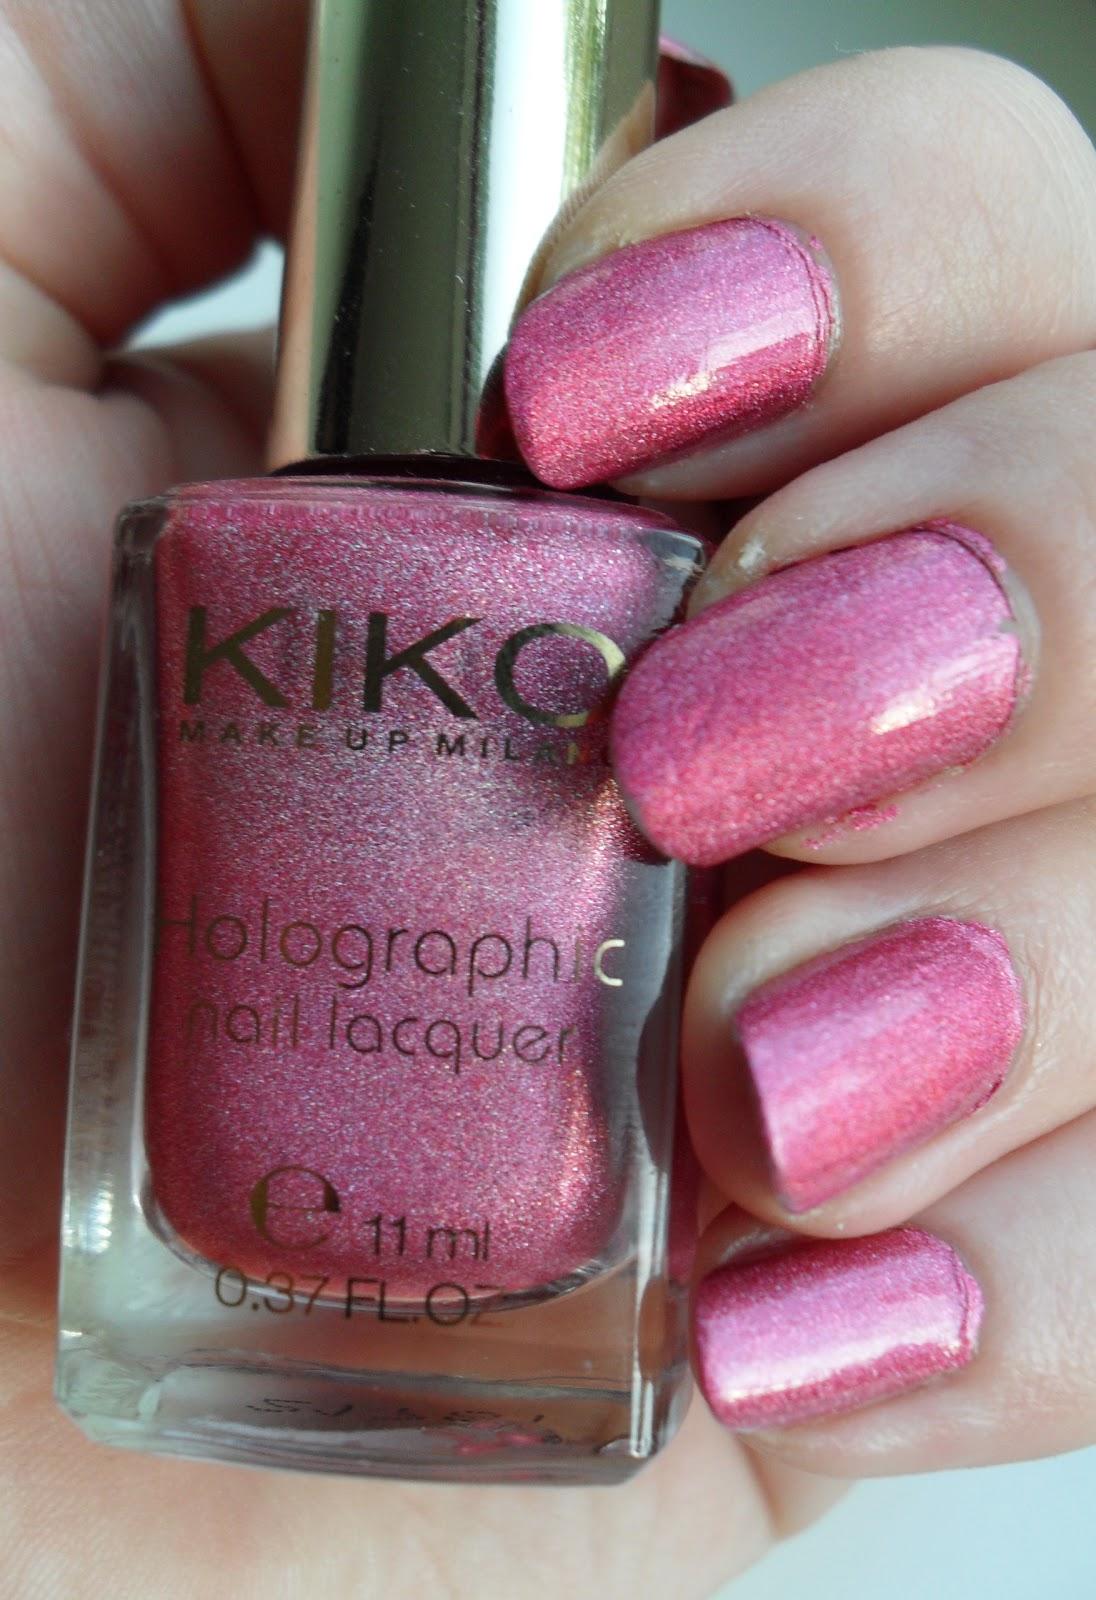 Kitty Cosmetic: Kiko Holographic Nagellack 402 Jewel Pink